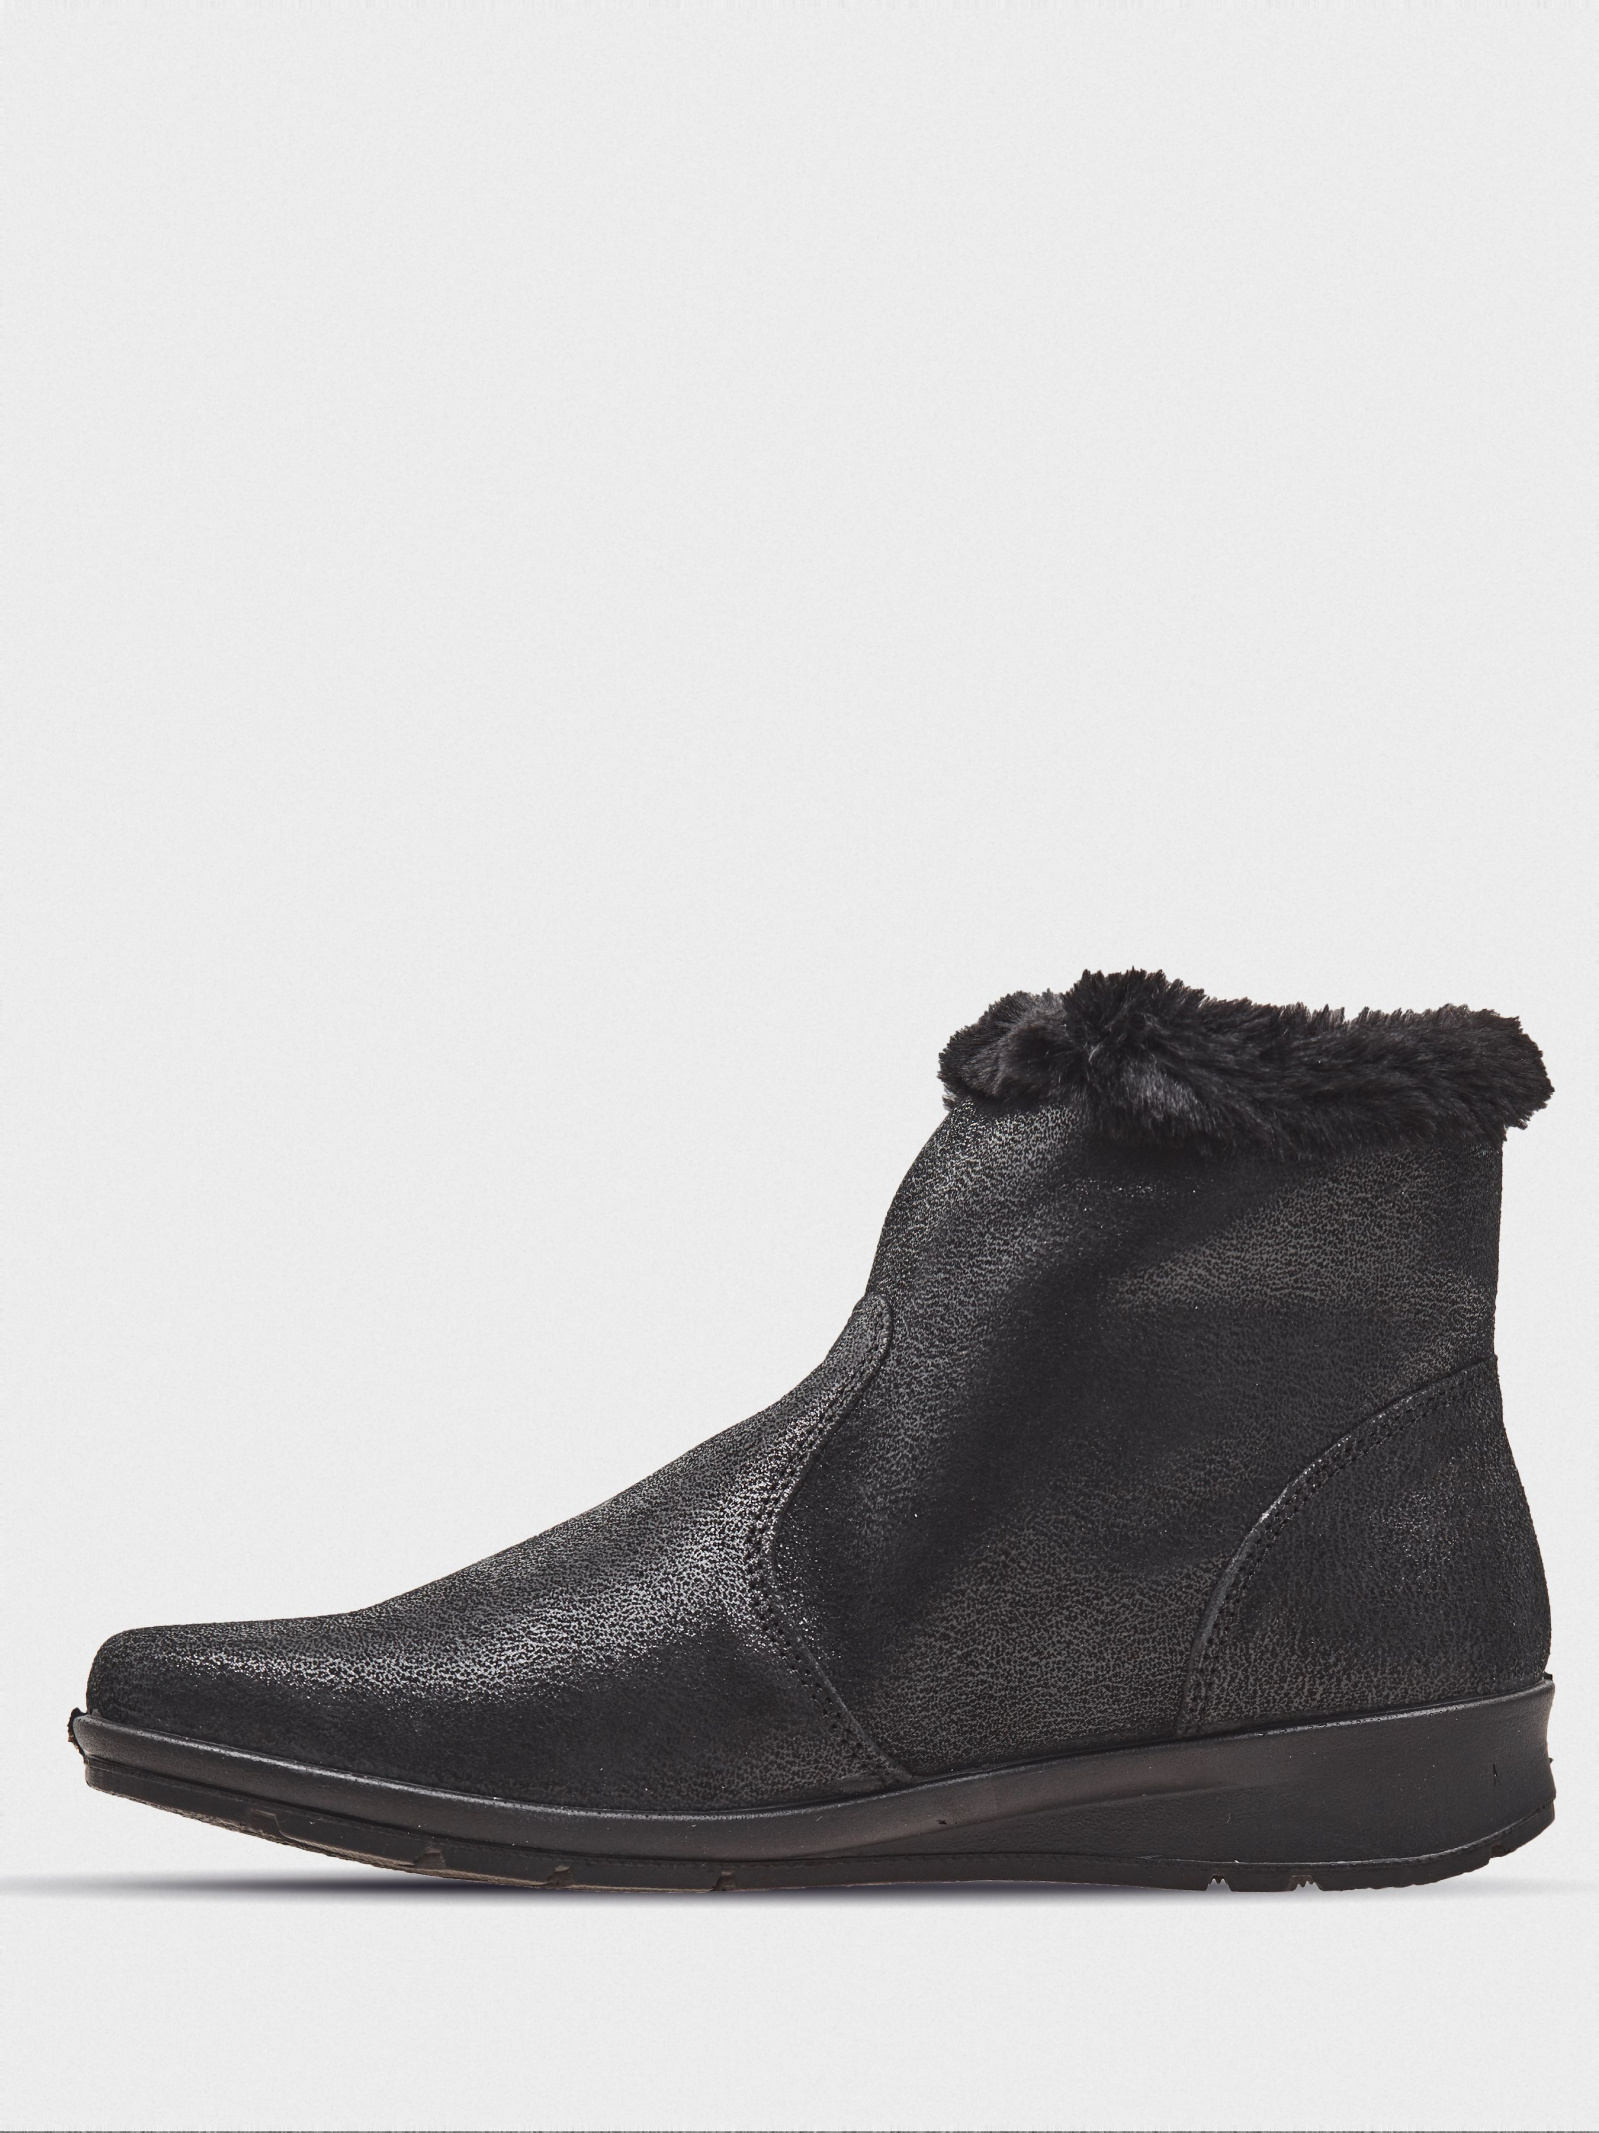 Ботинки для женщин IMAC YQ154 примерка, 2017